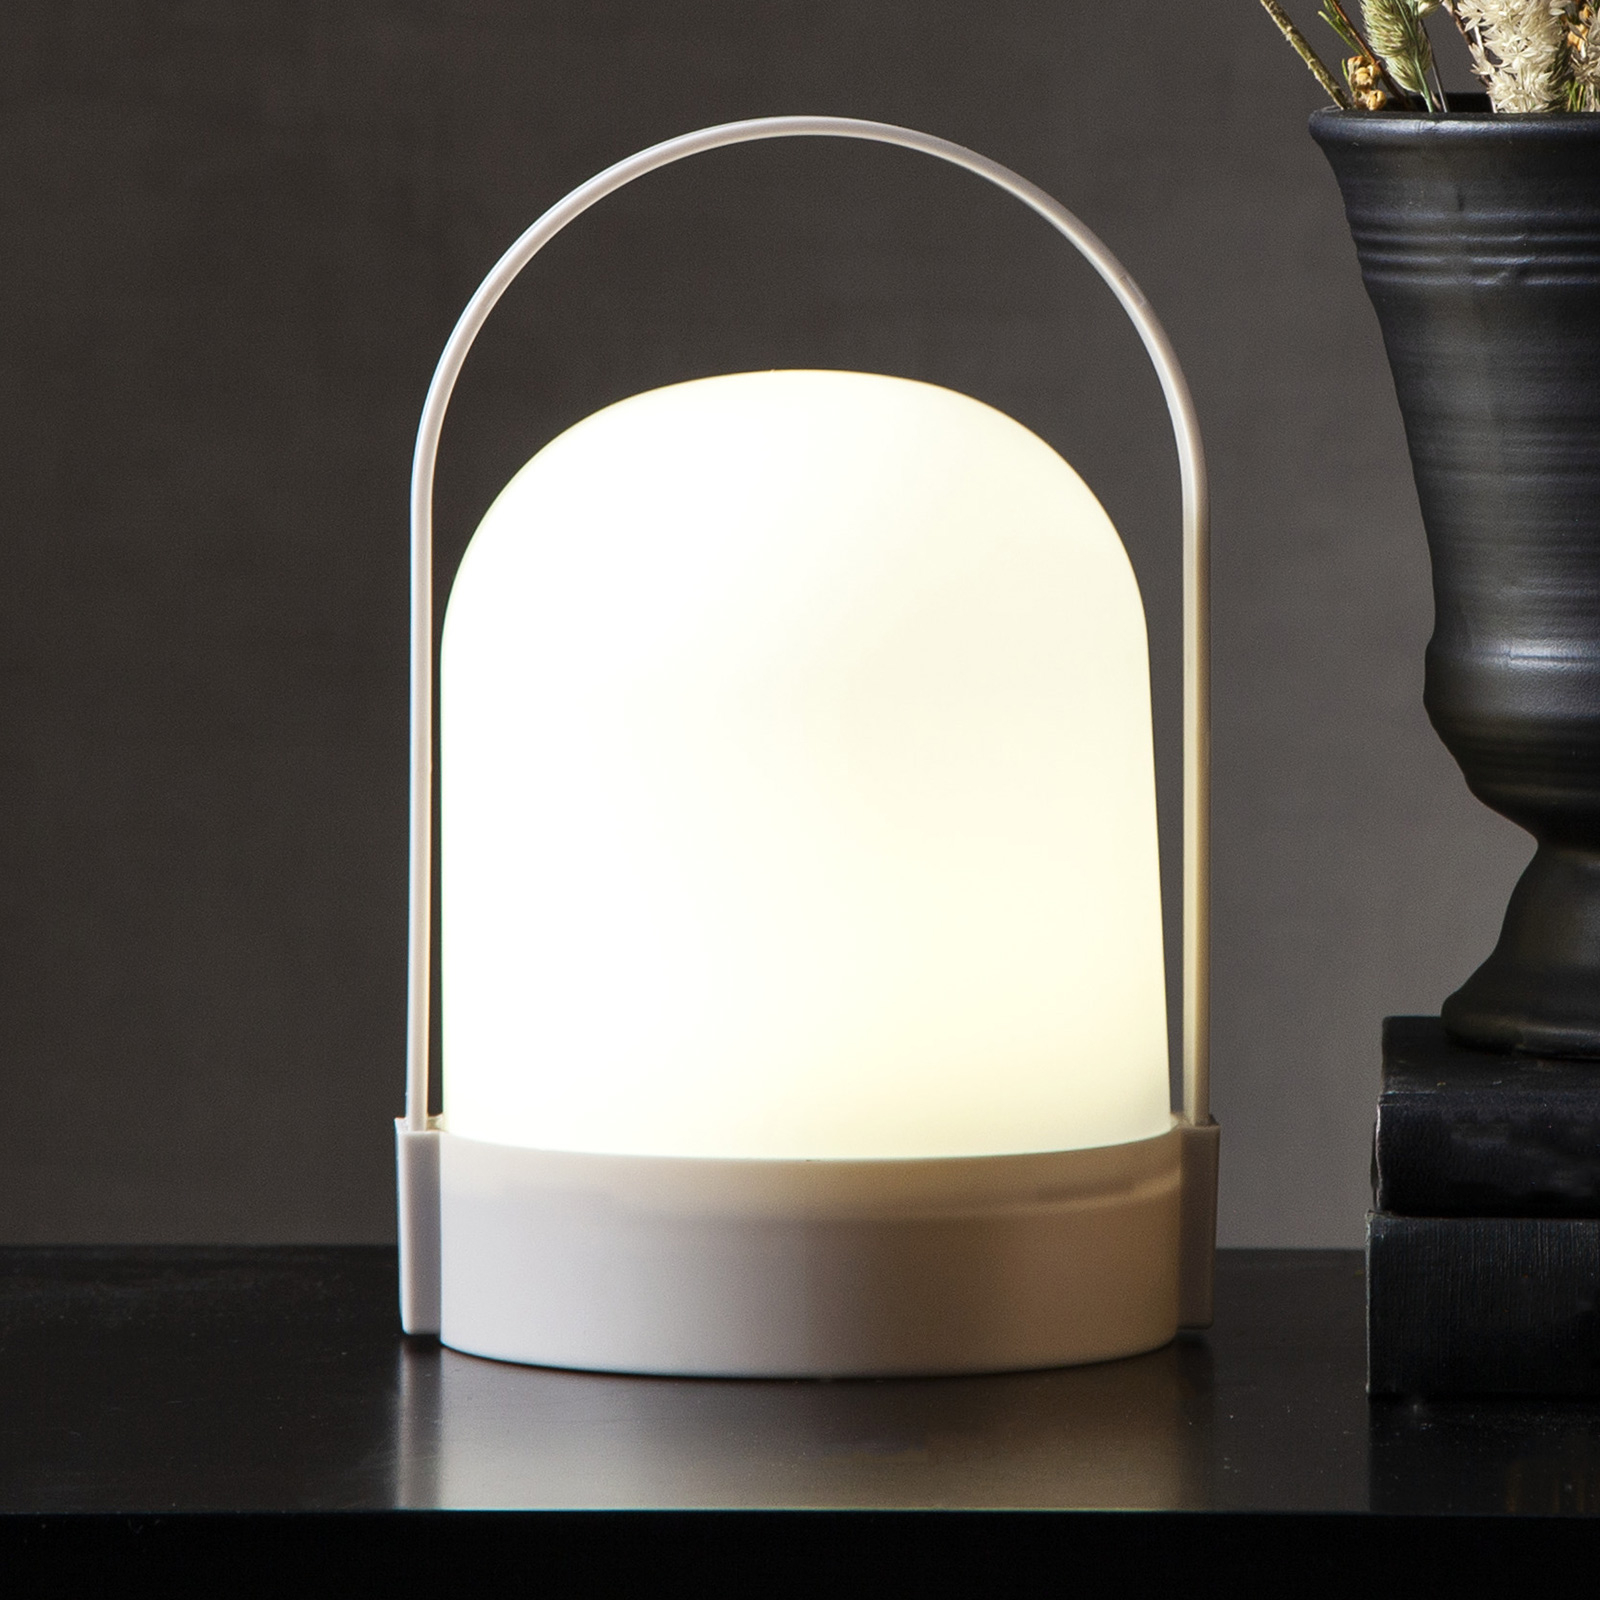 Lette-LED-pöytävalo ajastimella, paristokäyttöinen